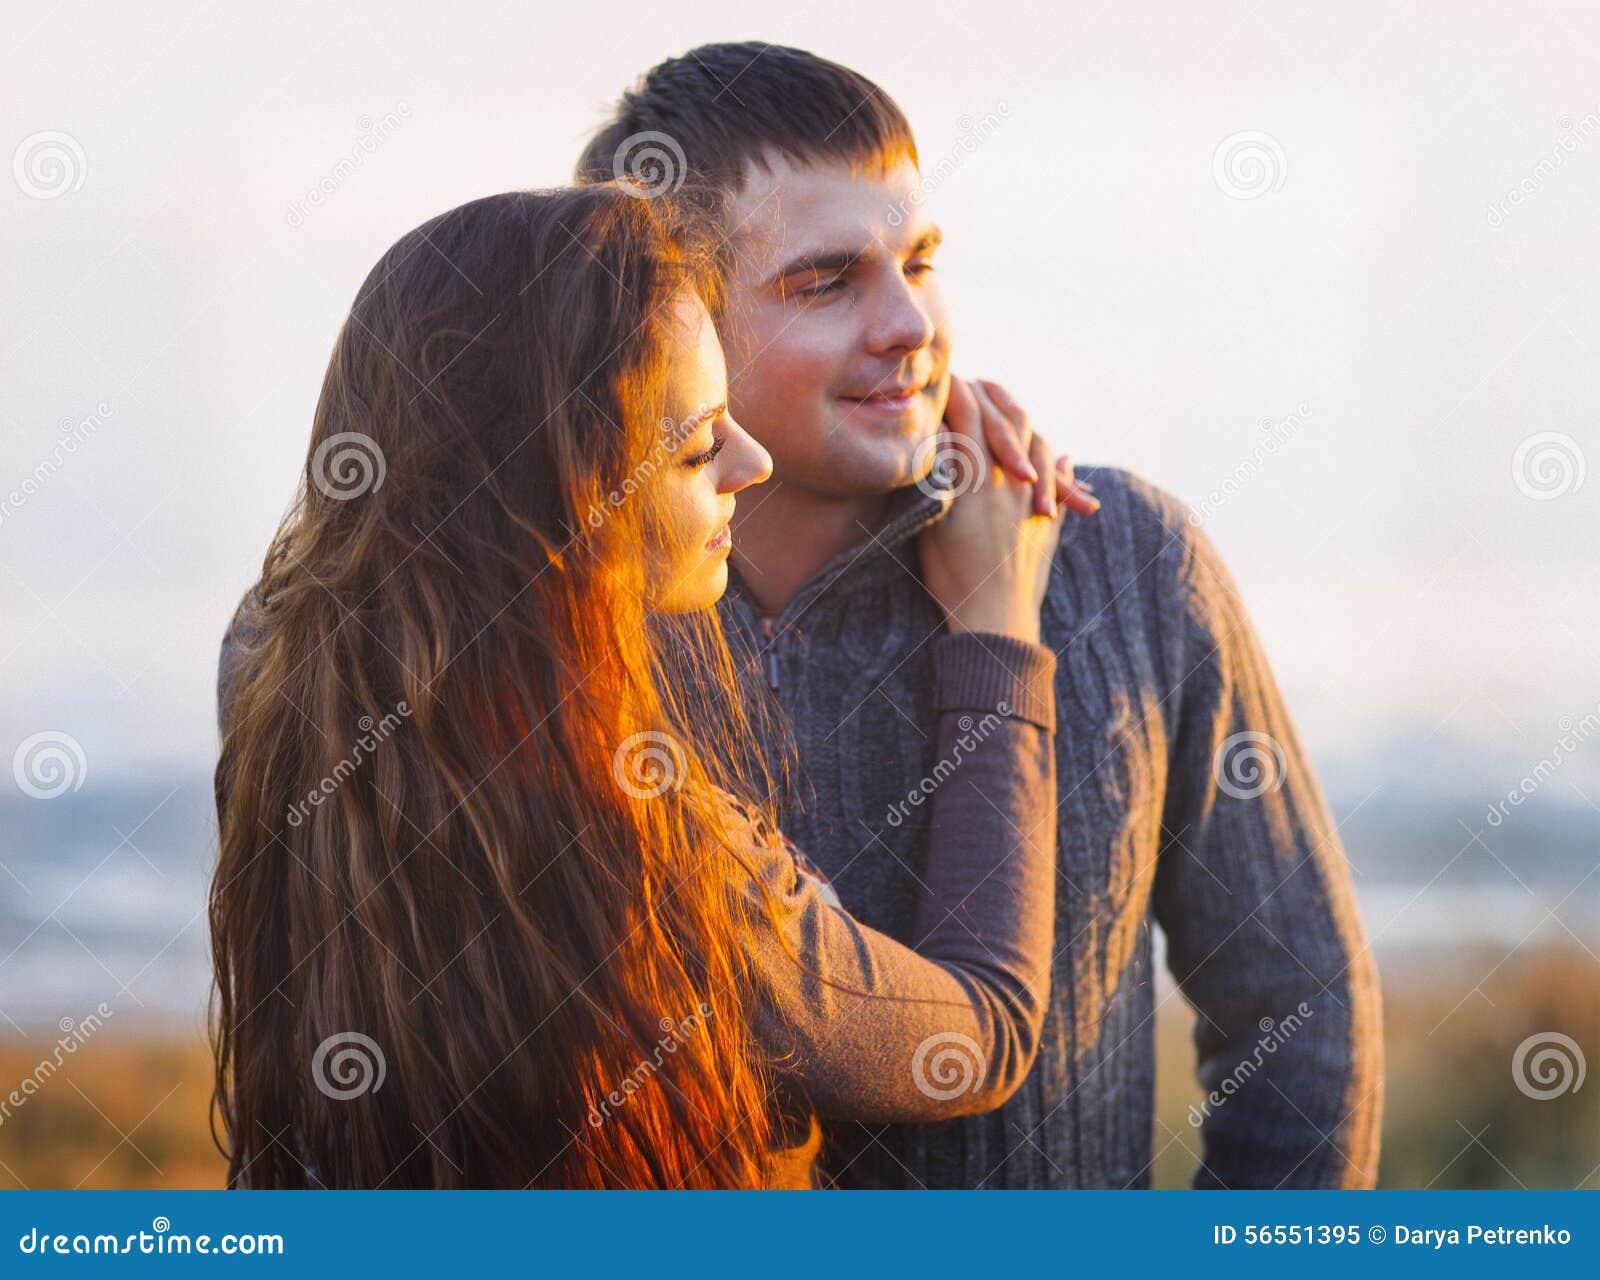 Download Πορτρέτο του νέου ευτυχούς ζεύγους που γελά σε μια κρύα ημέρα από το Aut Στοκ Εικόνα - εικόνα από γέλιο, φθινοπώρου: 56551395